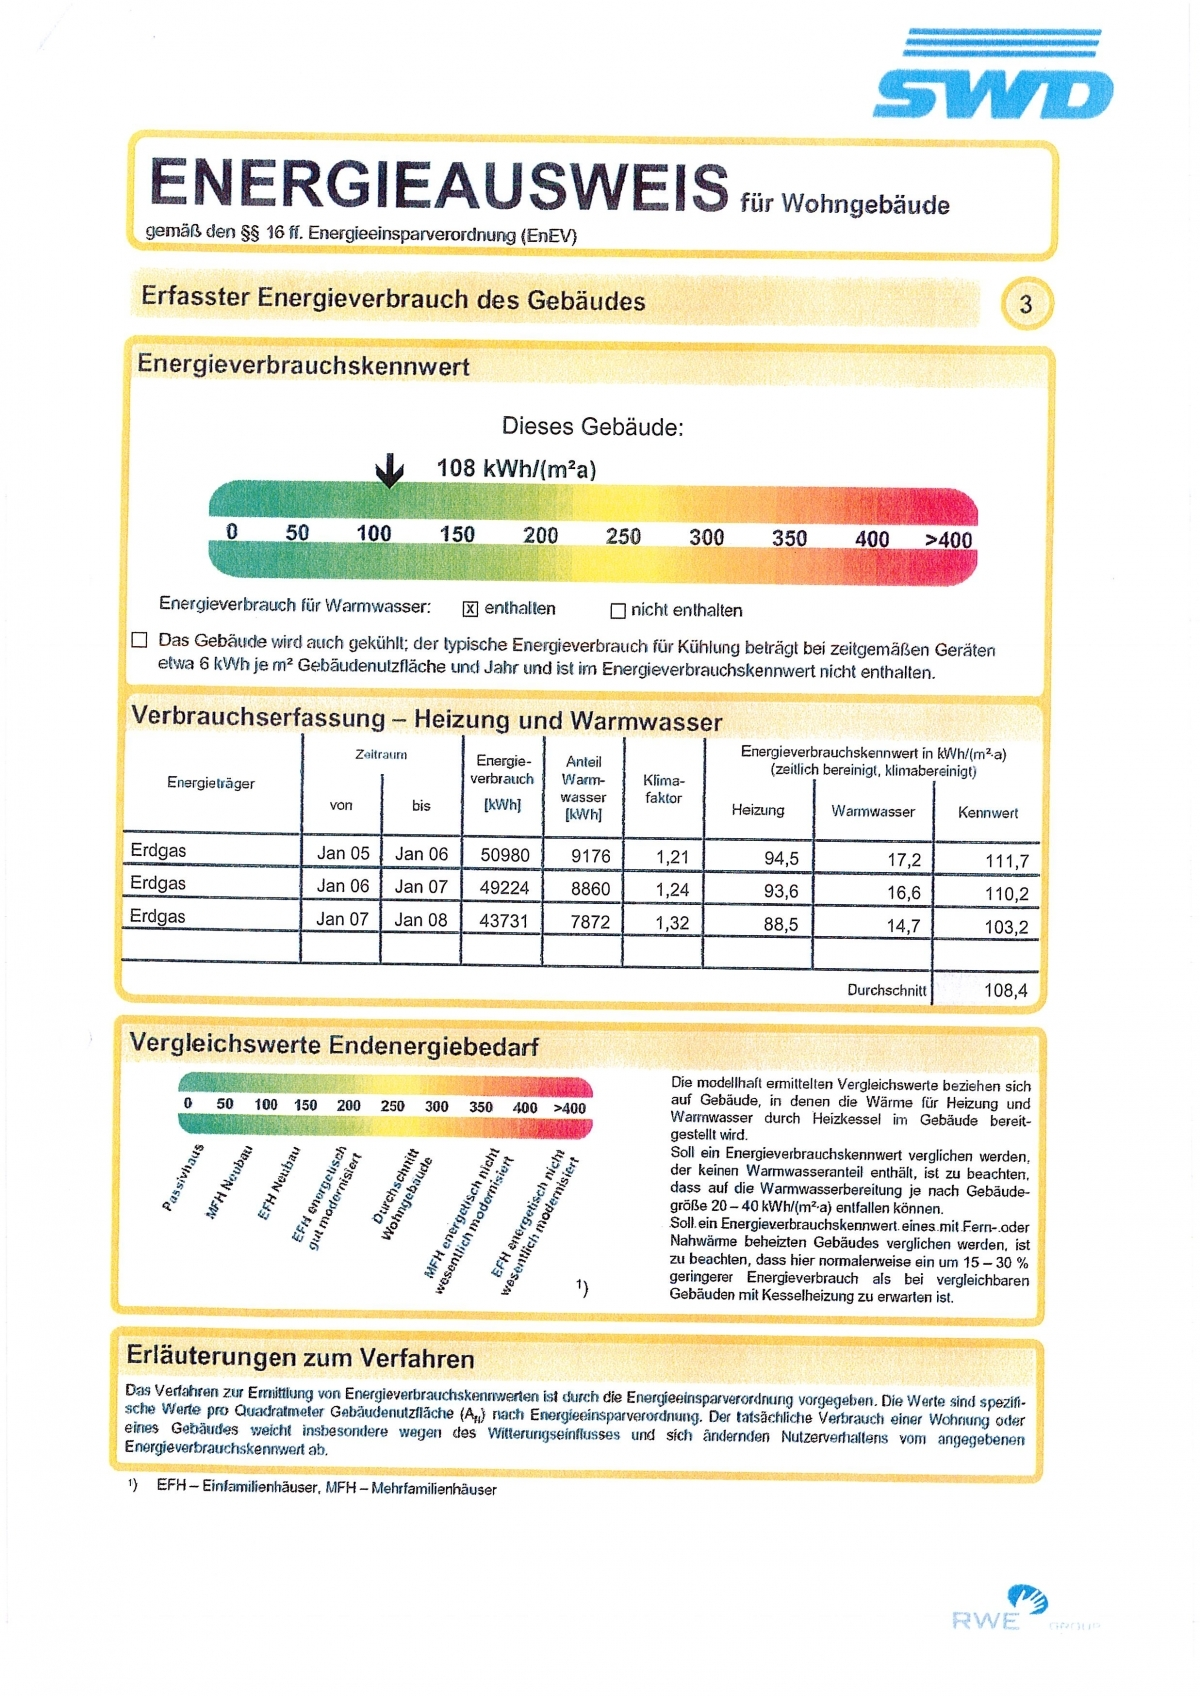 Energieausweis 1